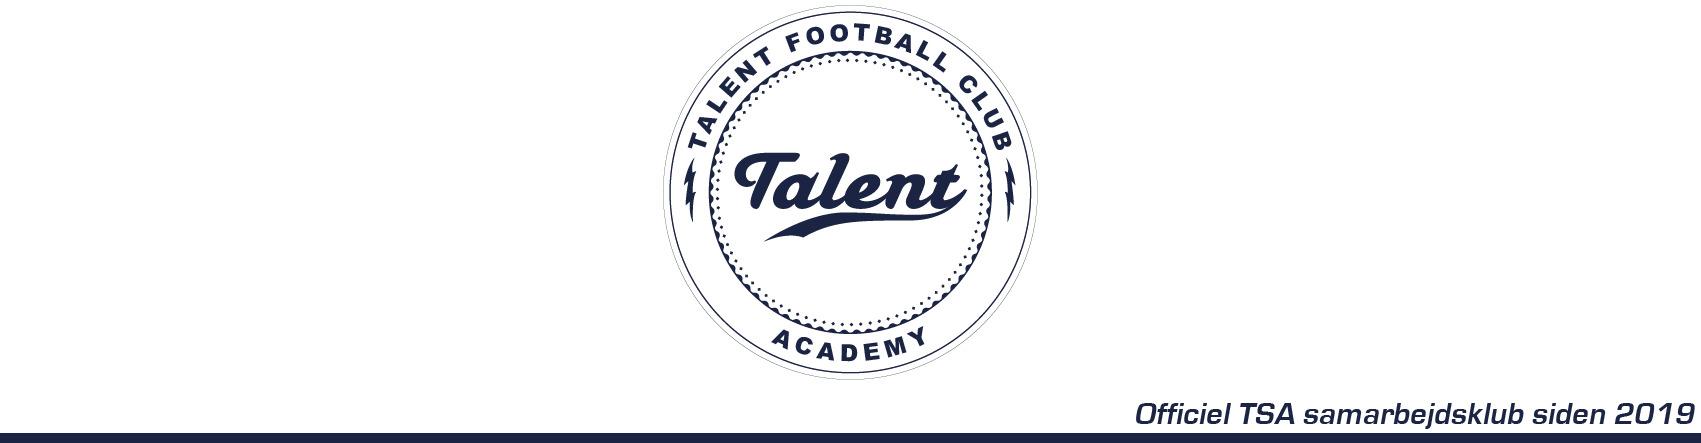 Talent_fc_academy-01